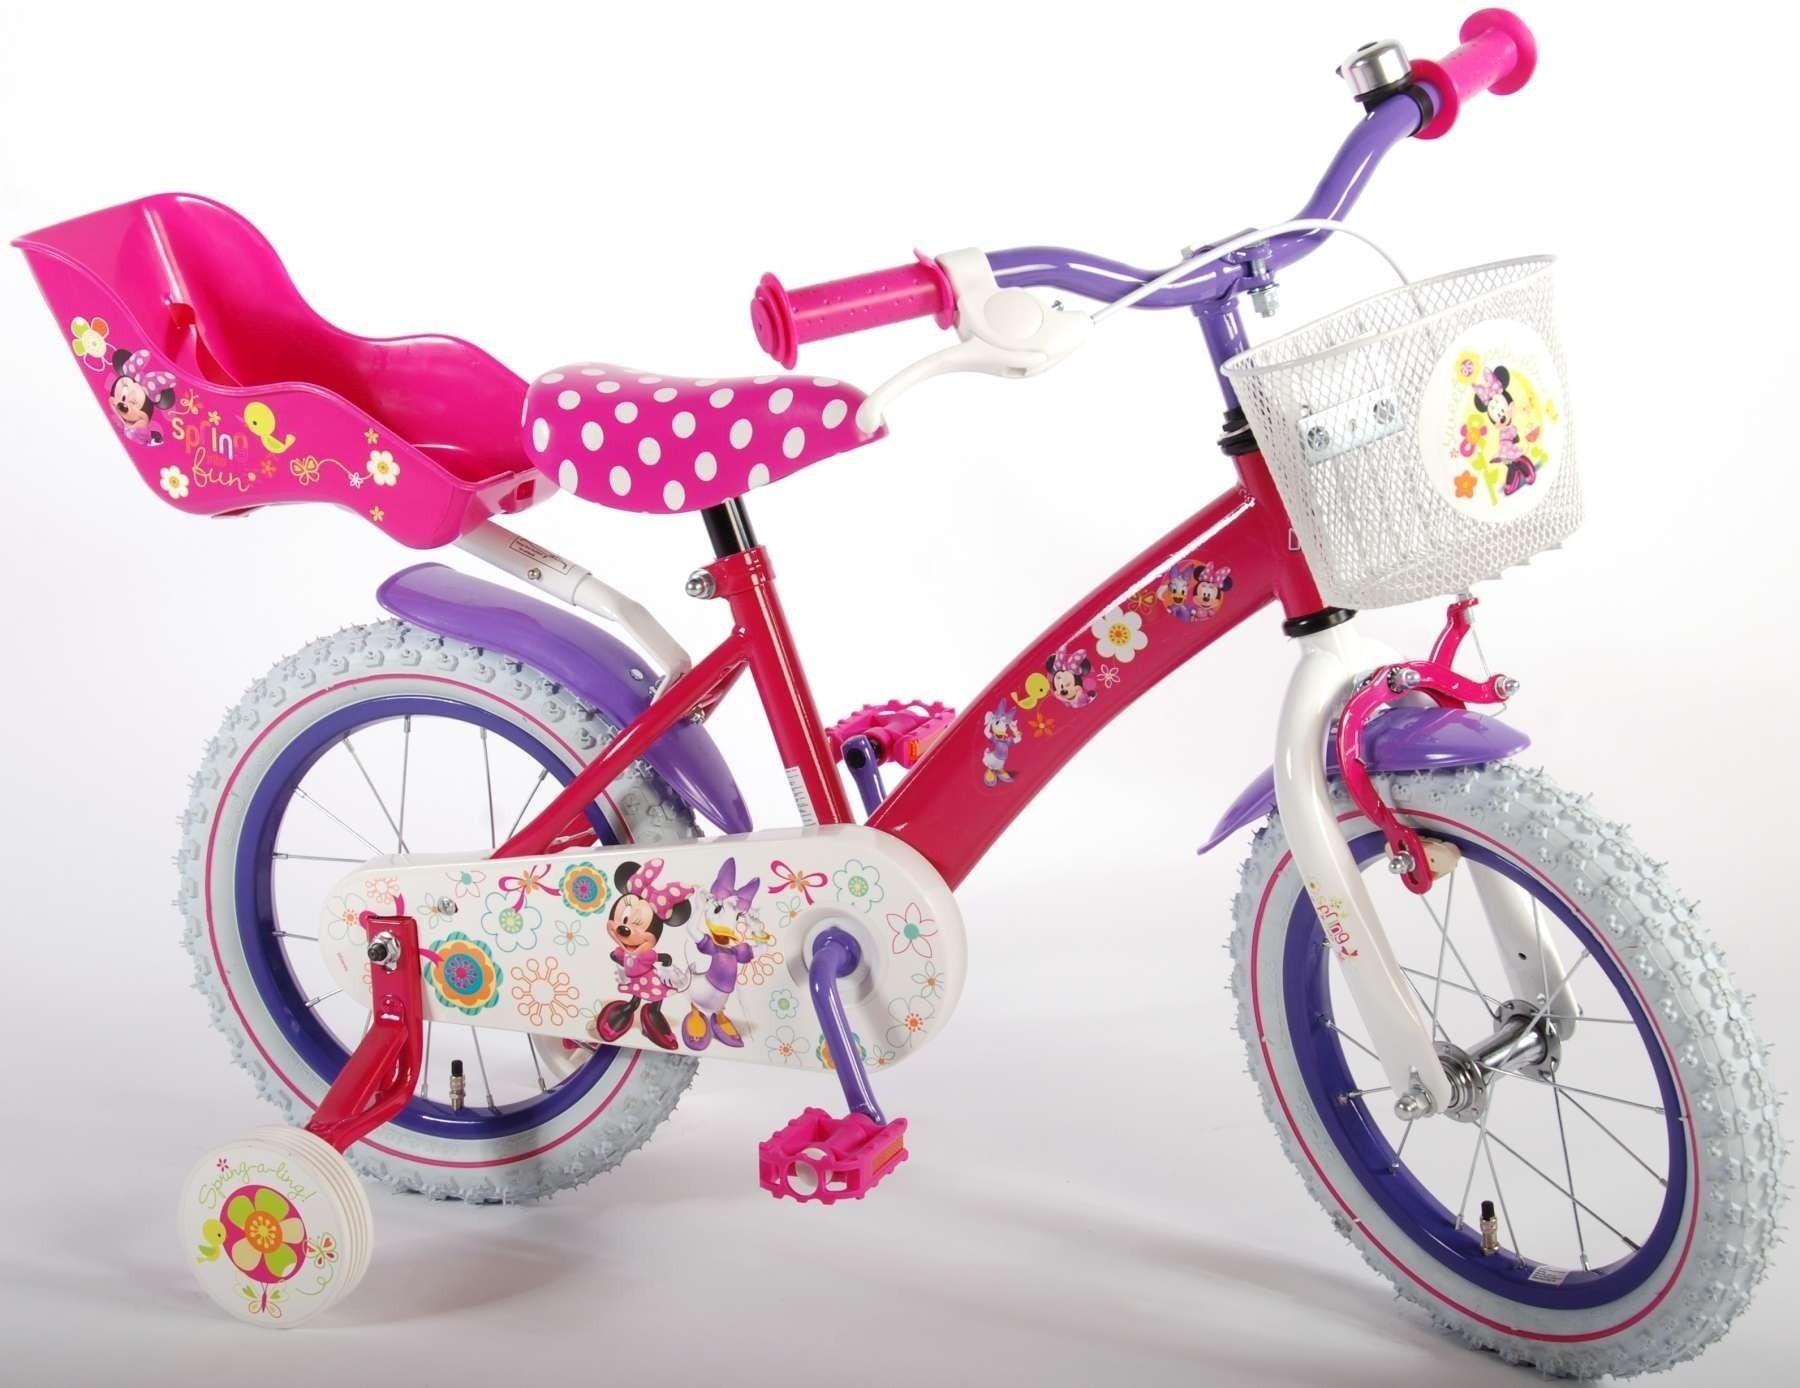 Disney Minnie Bow-Tique 14 inch meisjesfiets 31426